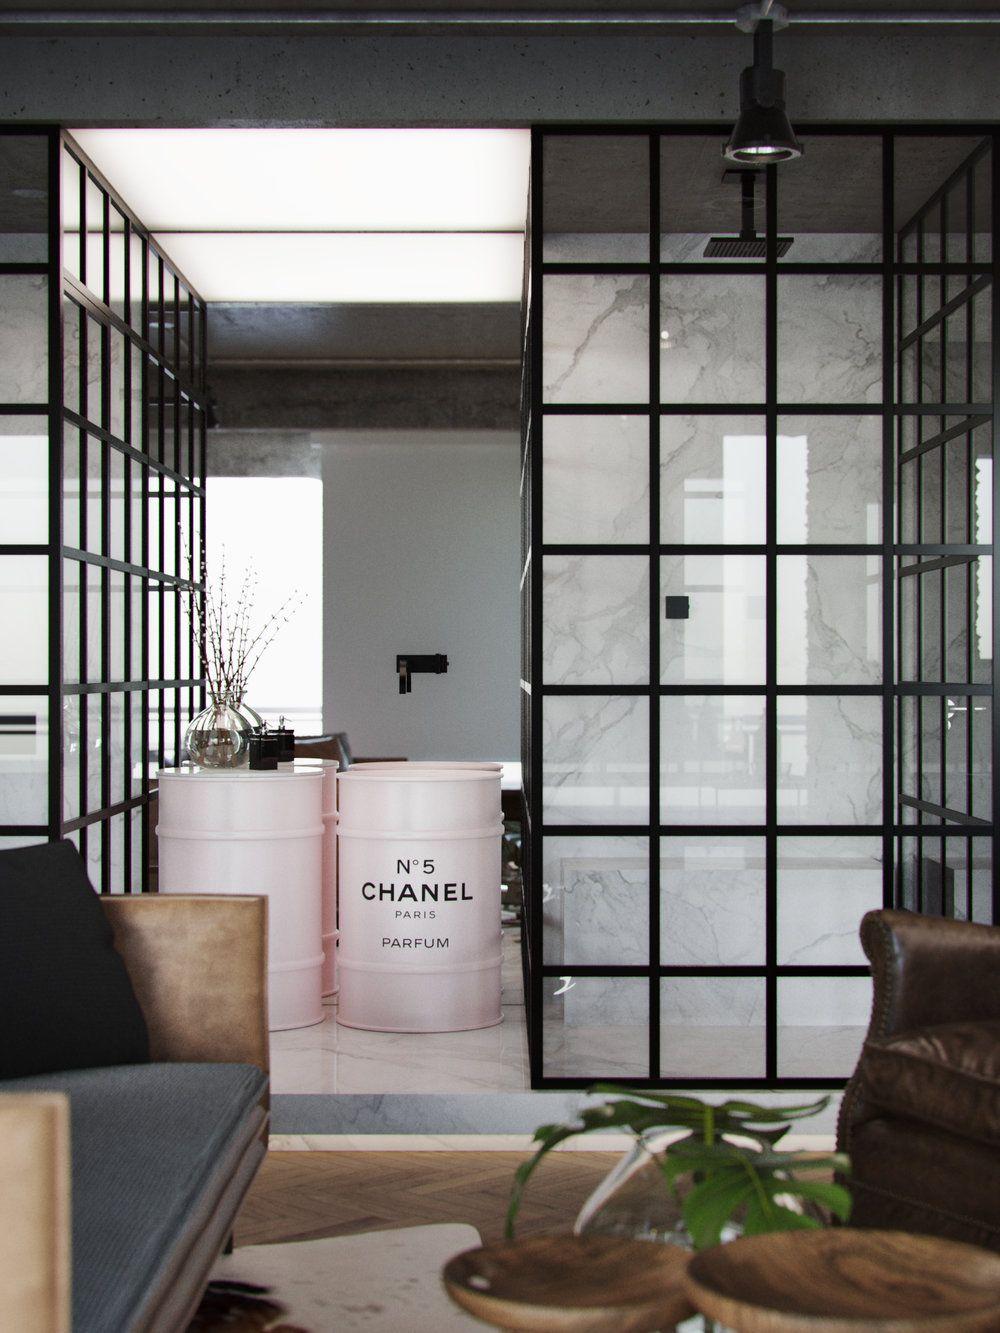 Un piso en brasil con sabor a nueva york industrial pinterest en brasil pisos en y nueva - Pisos en new york ...